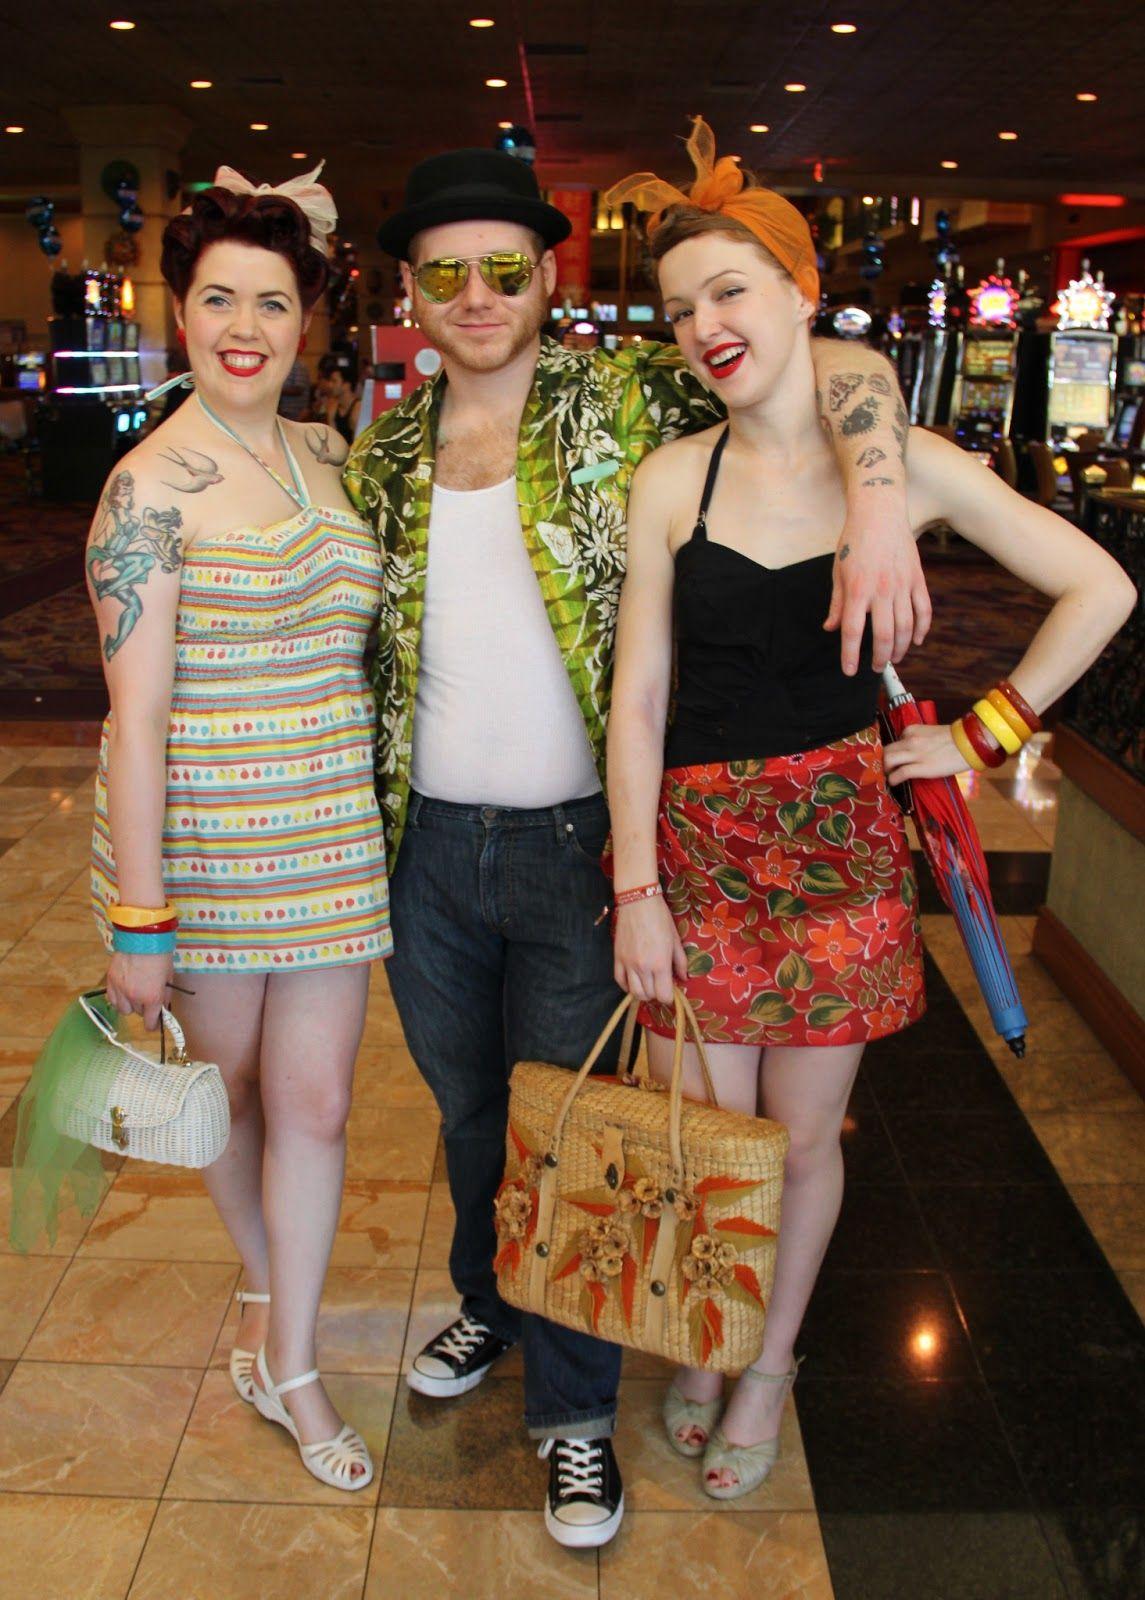 Pin By Cherry Lips On Viva Las Vegas Fashion Rockabilly Fashion Girl Outfits Las Vegas Fashion